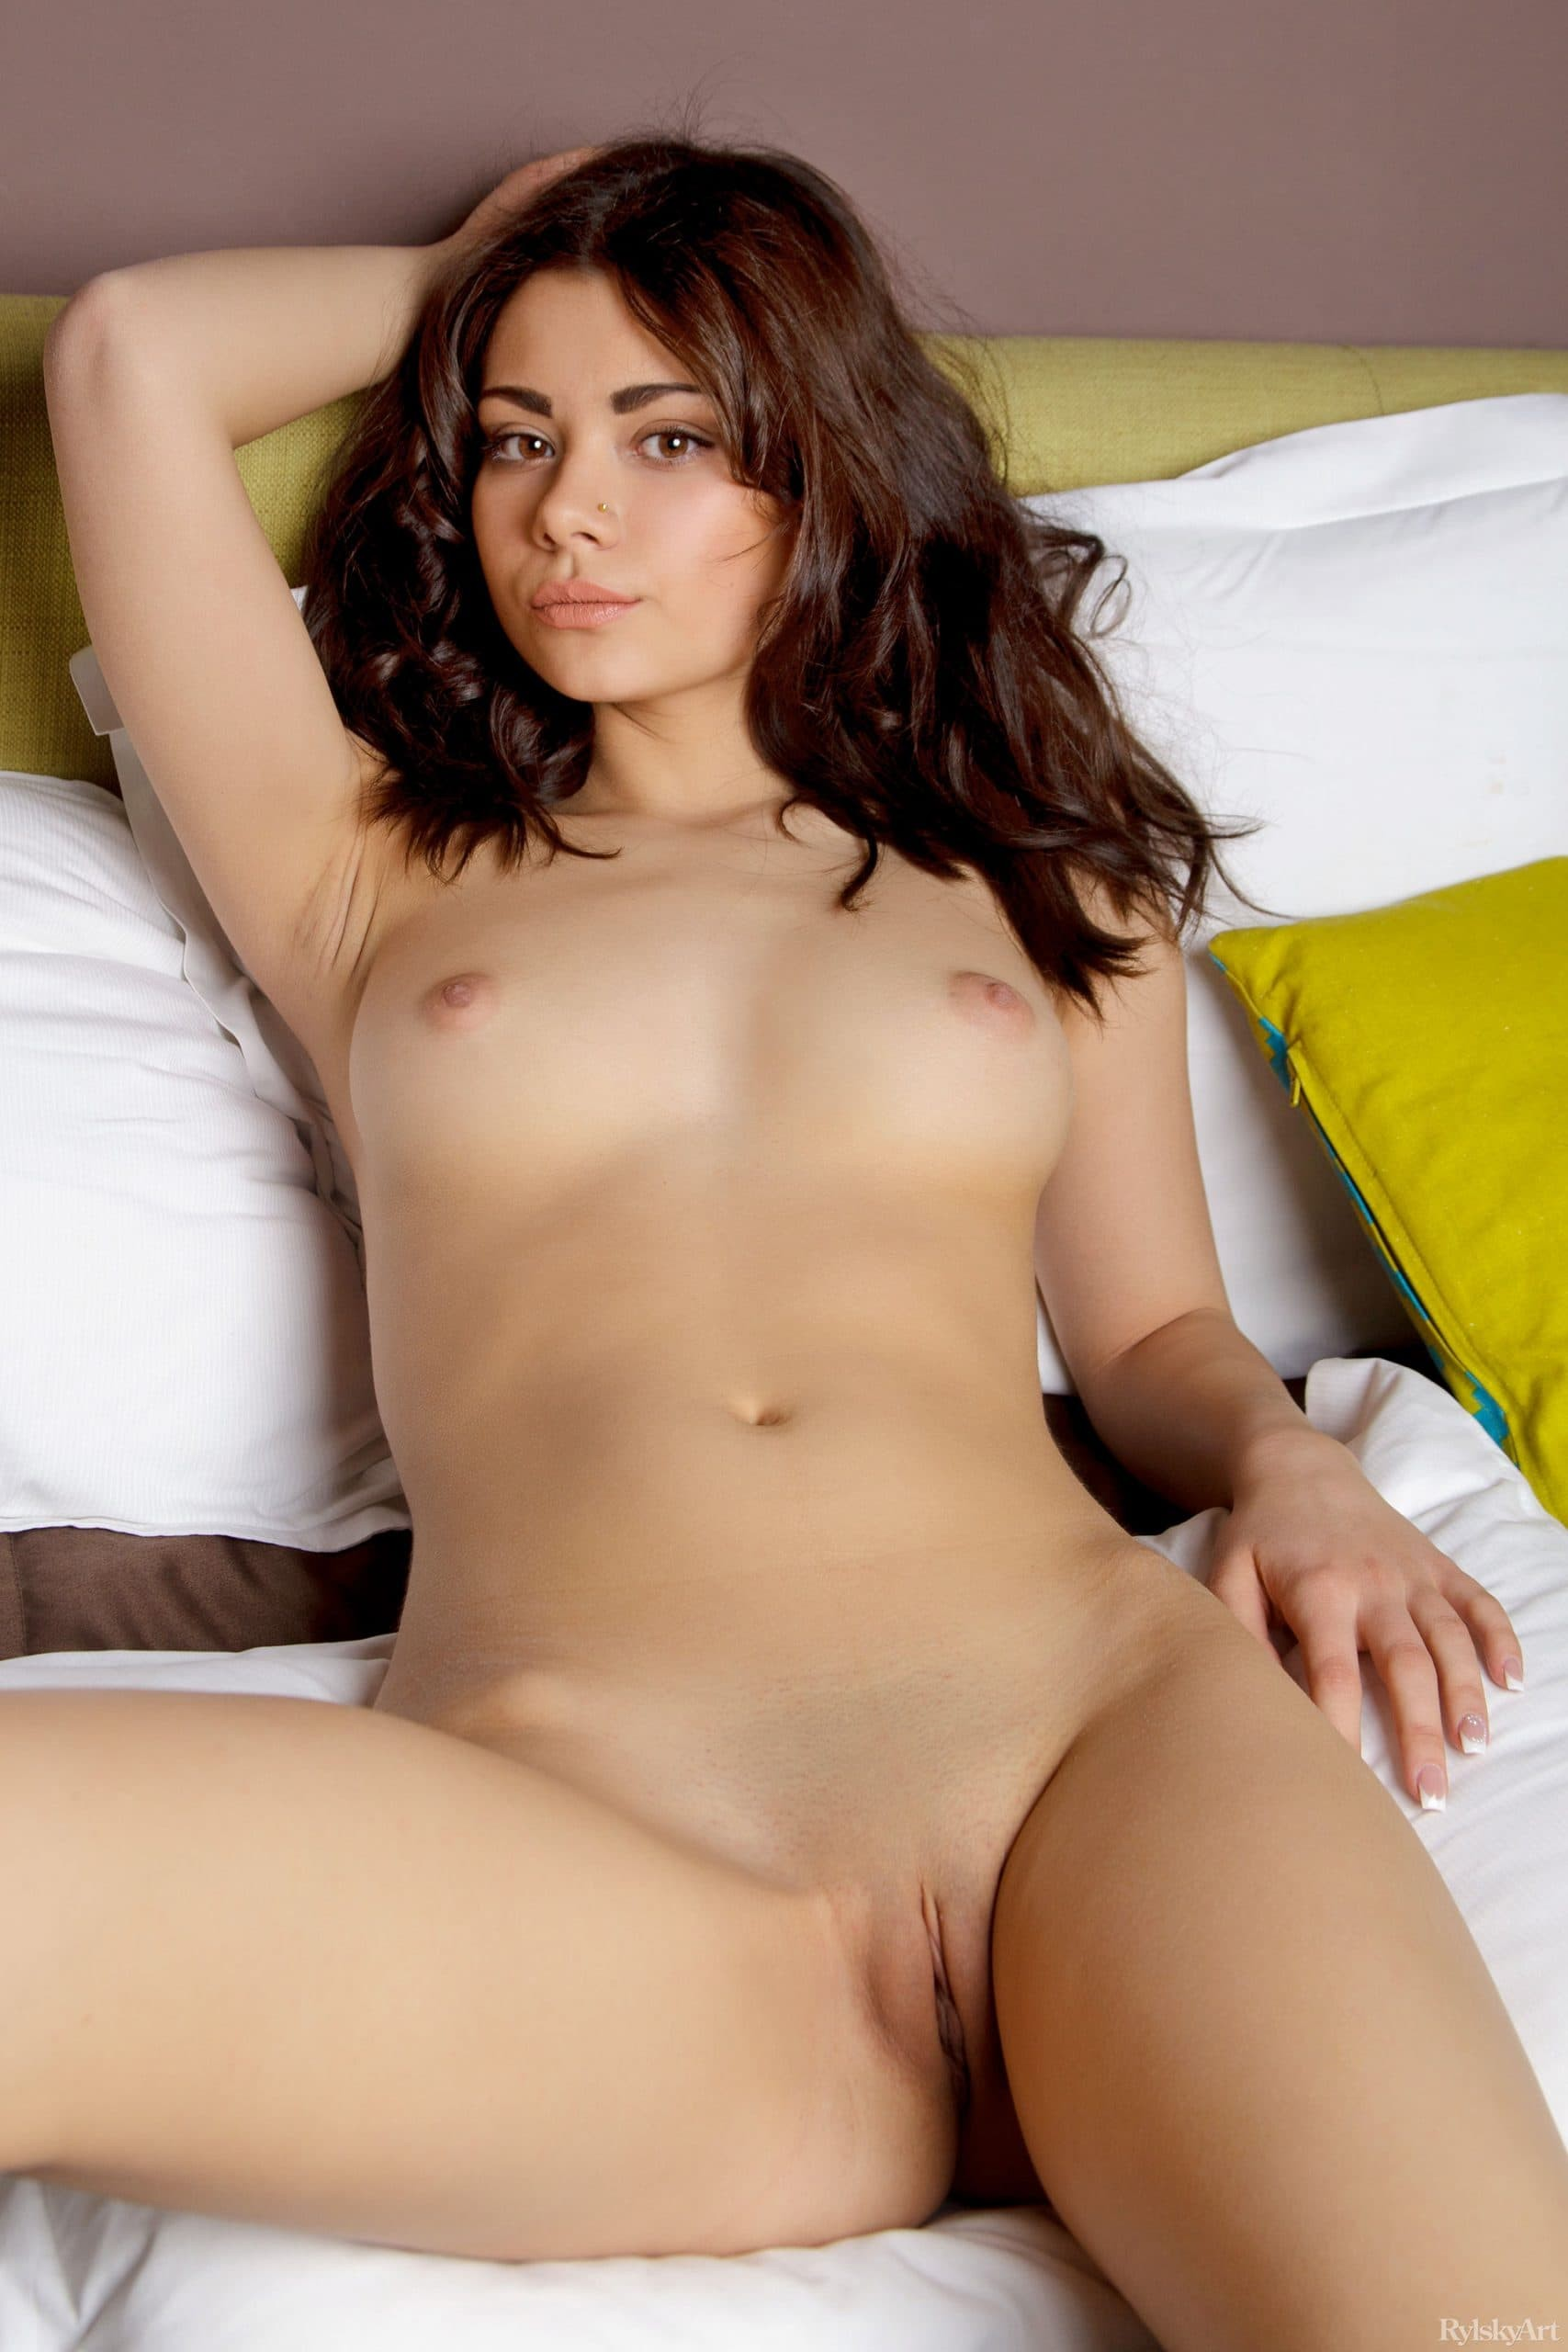 Красавица со сладкой бритой киской - фото